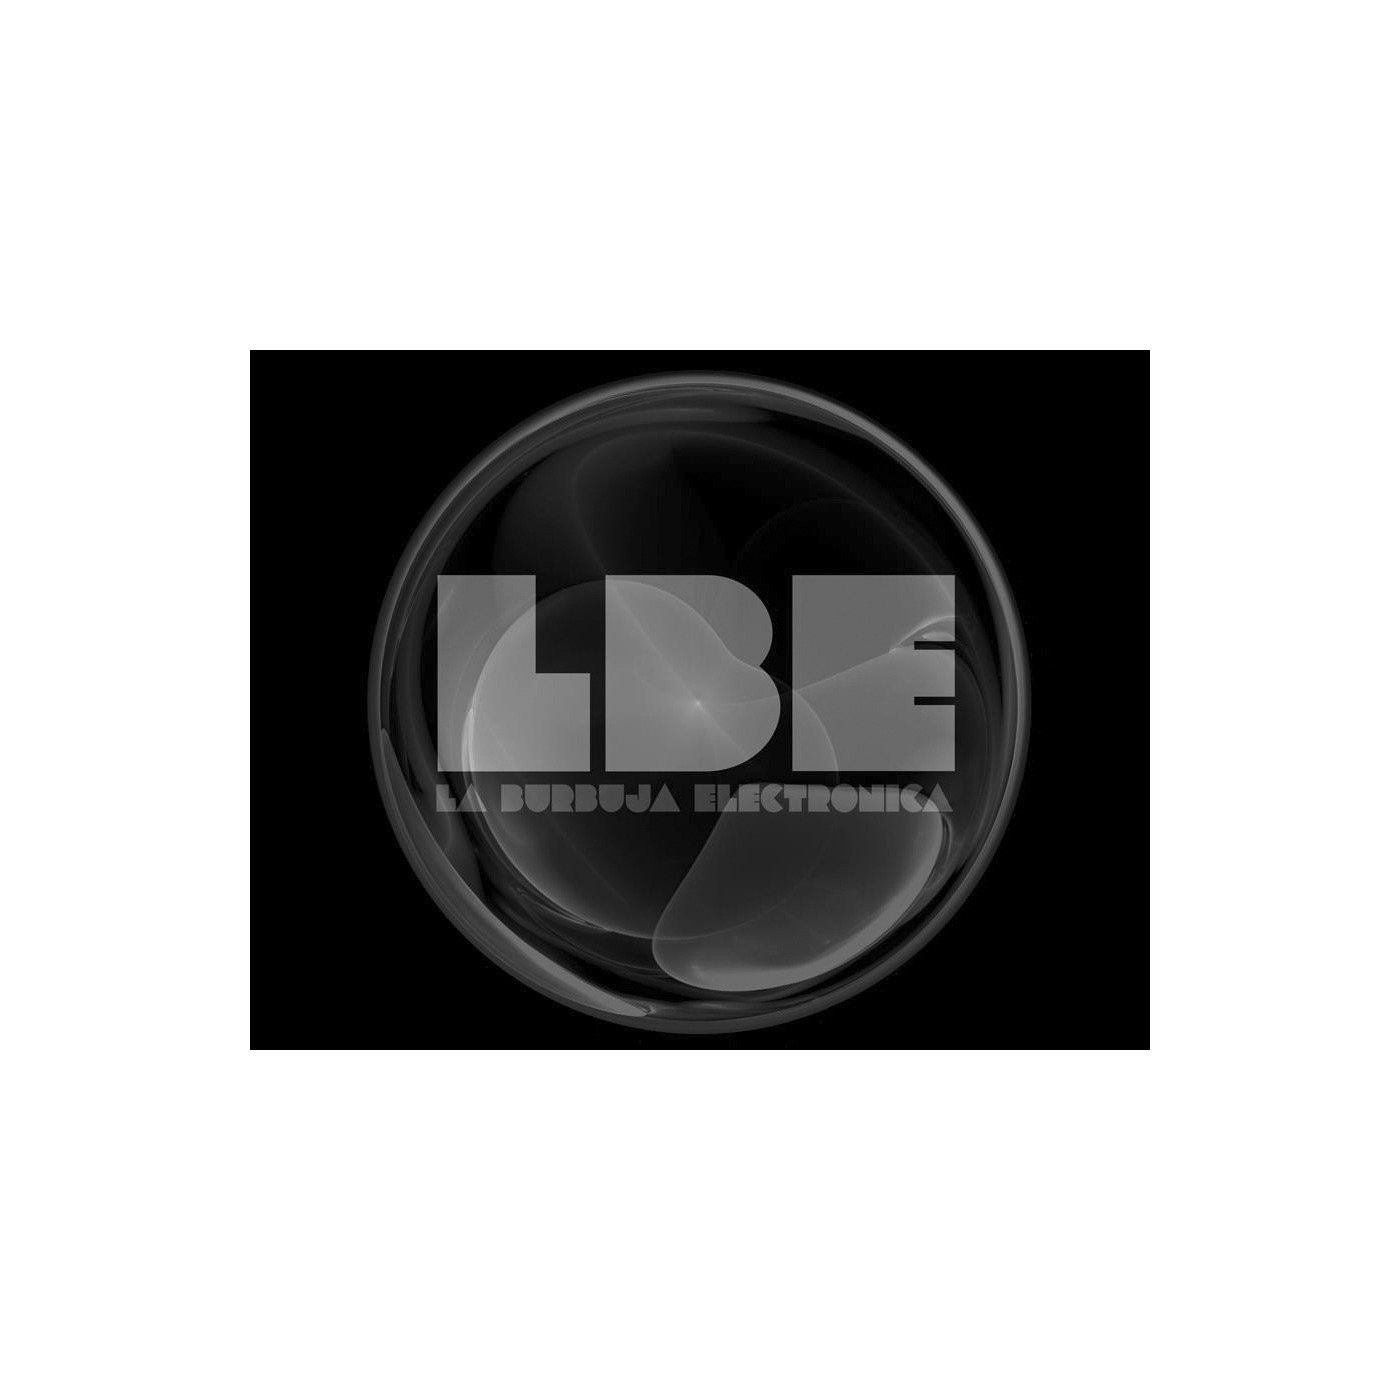 <![CDATA[Podcast La Burbuja Electrónica]]>